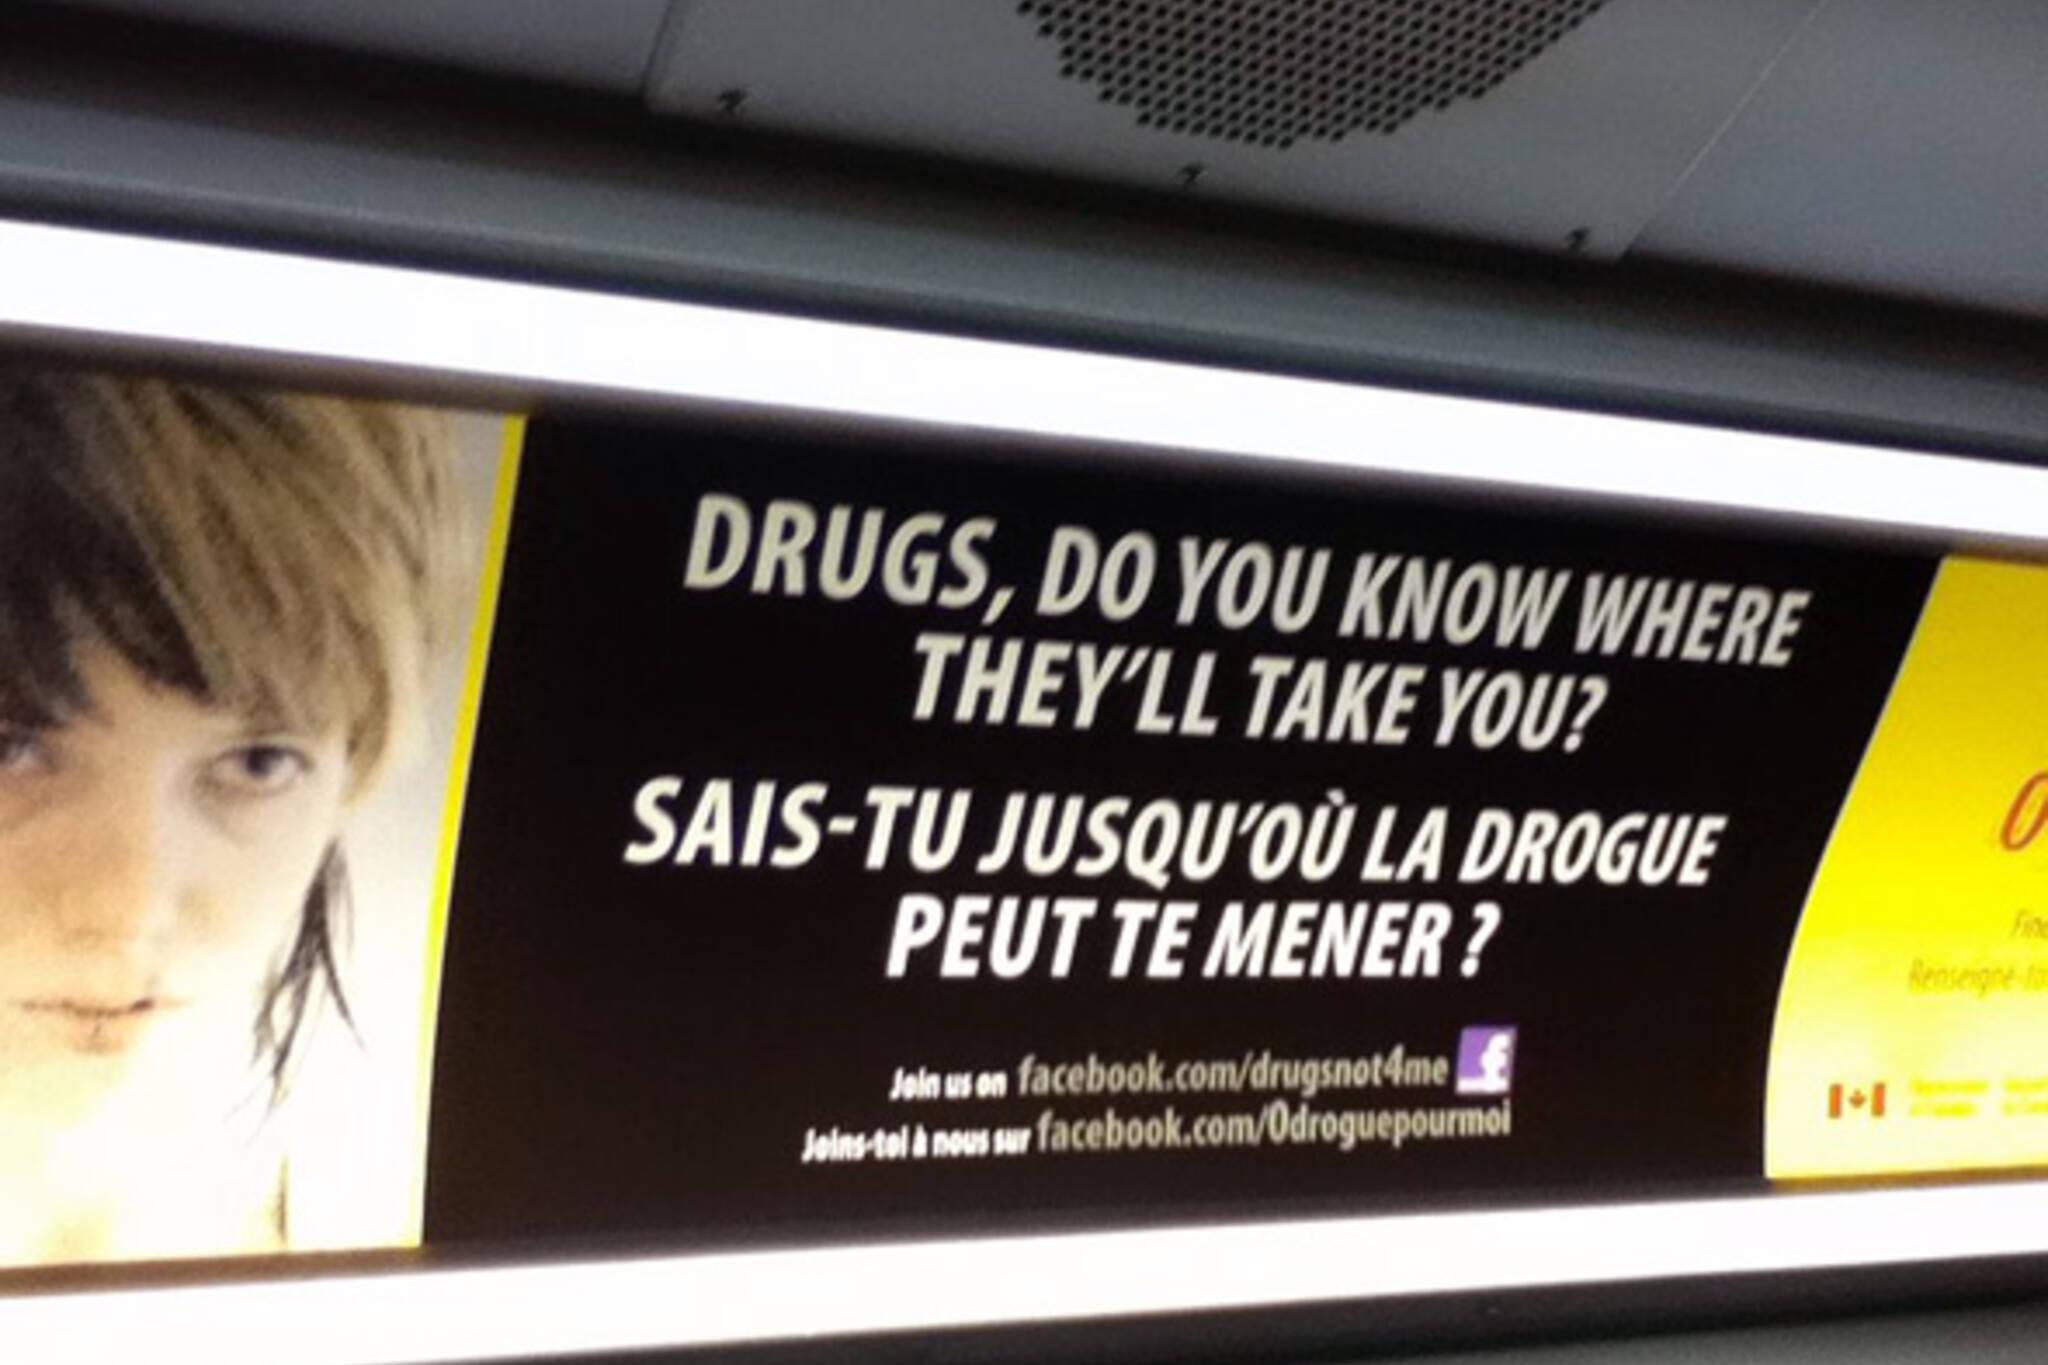 drugsnot4me